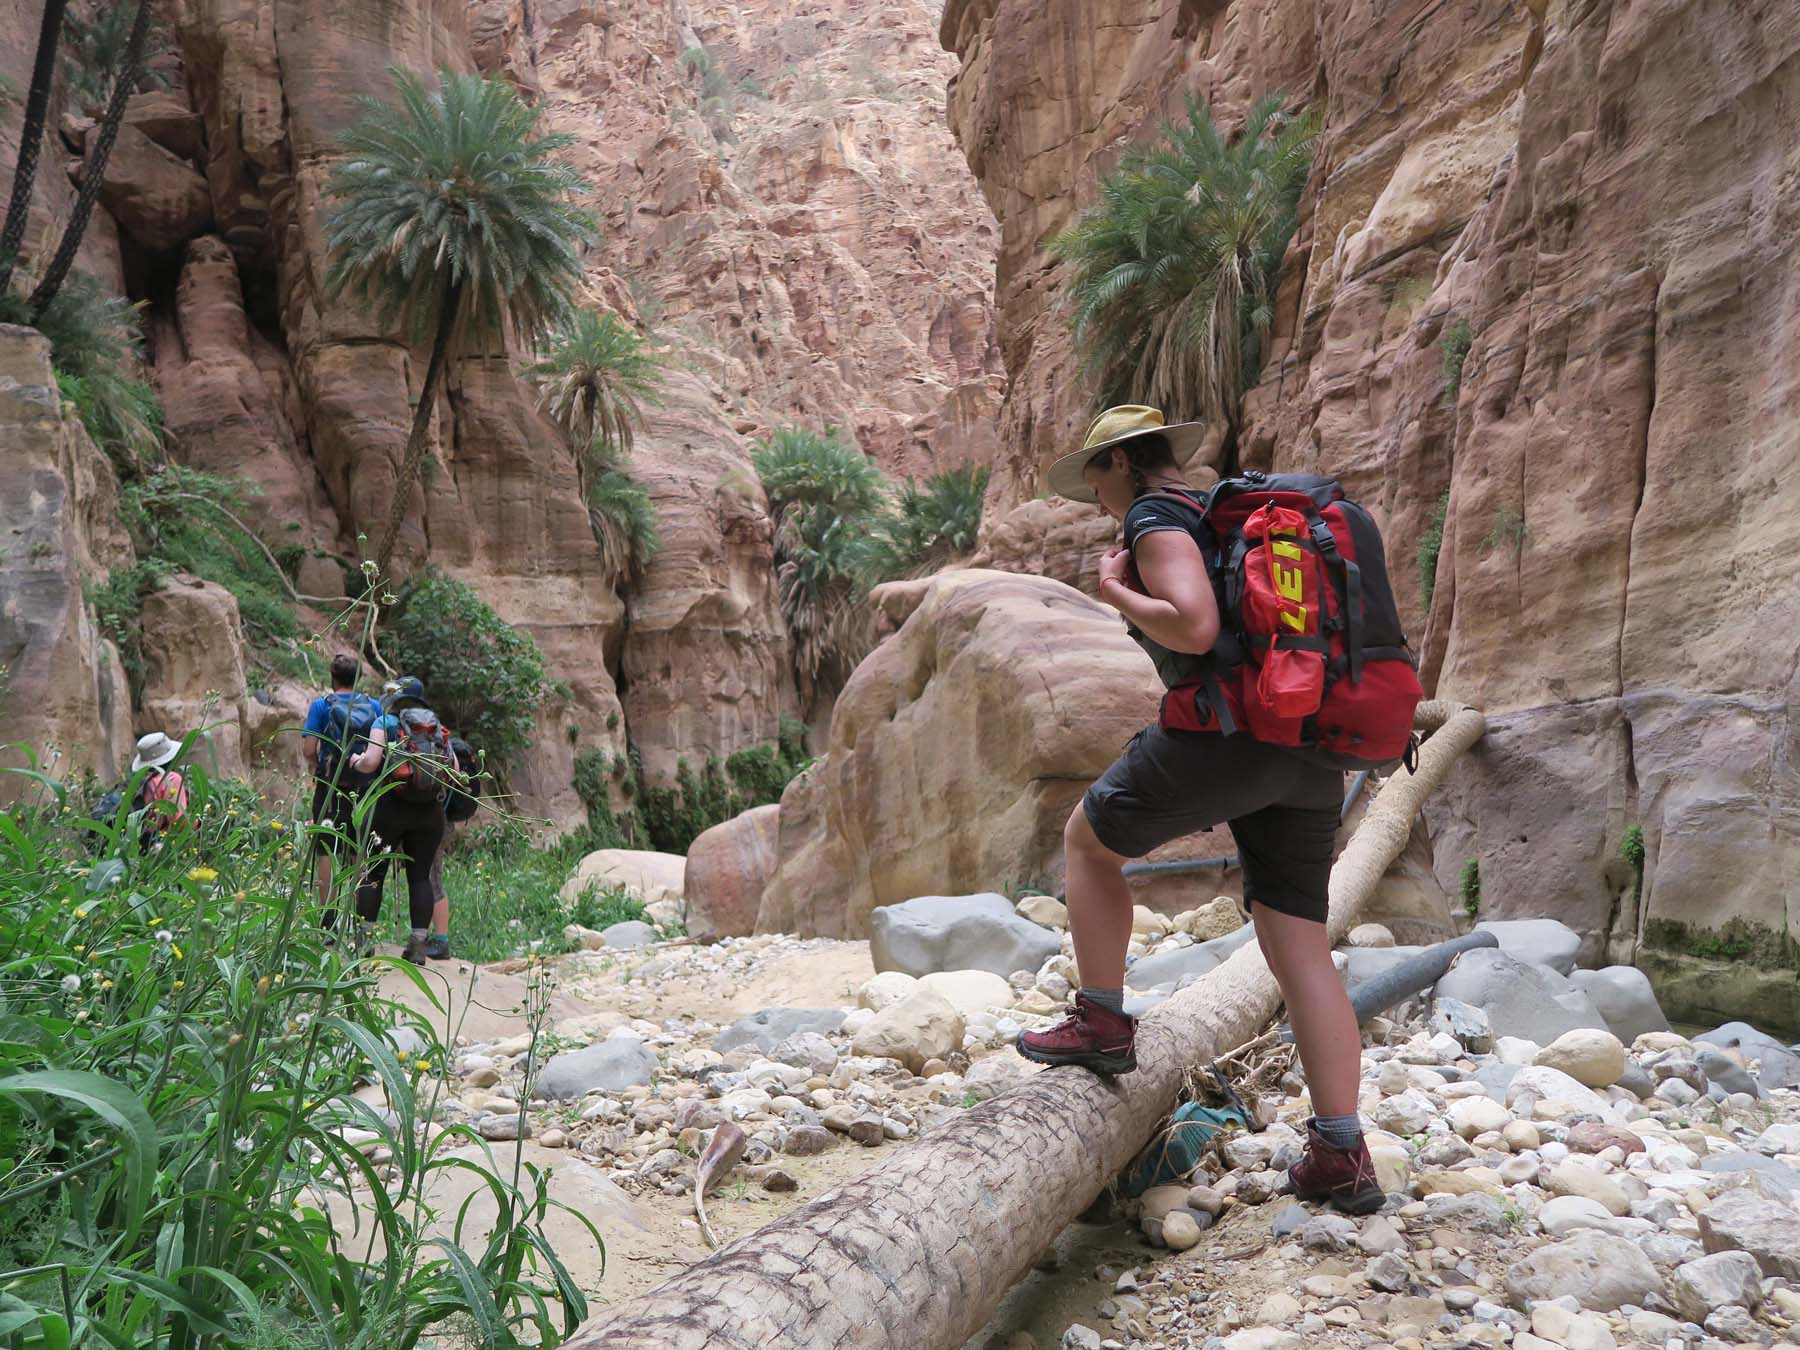 f070ce08d0 Pics   Vids. 360 s Petra and Desert adventure in Jordan